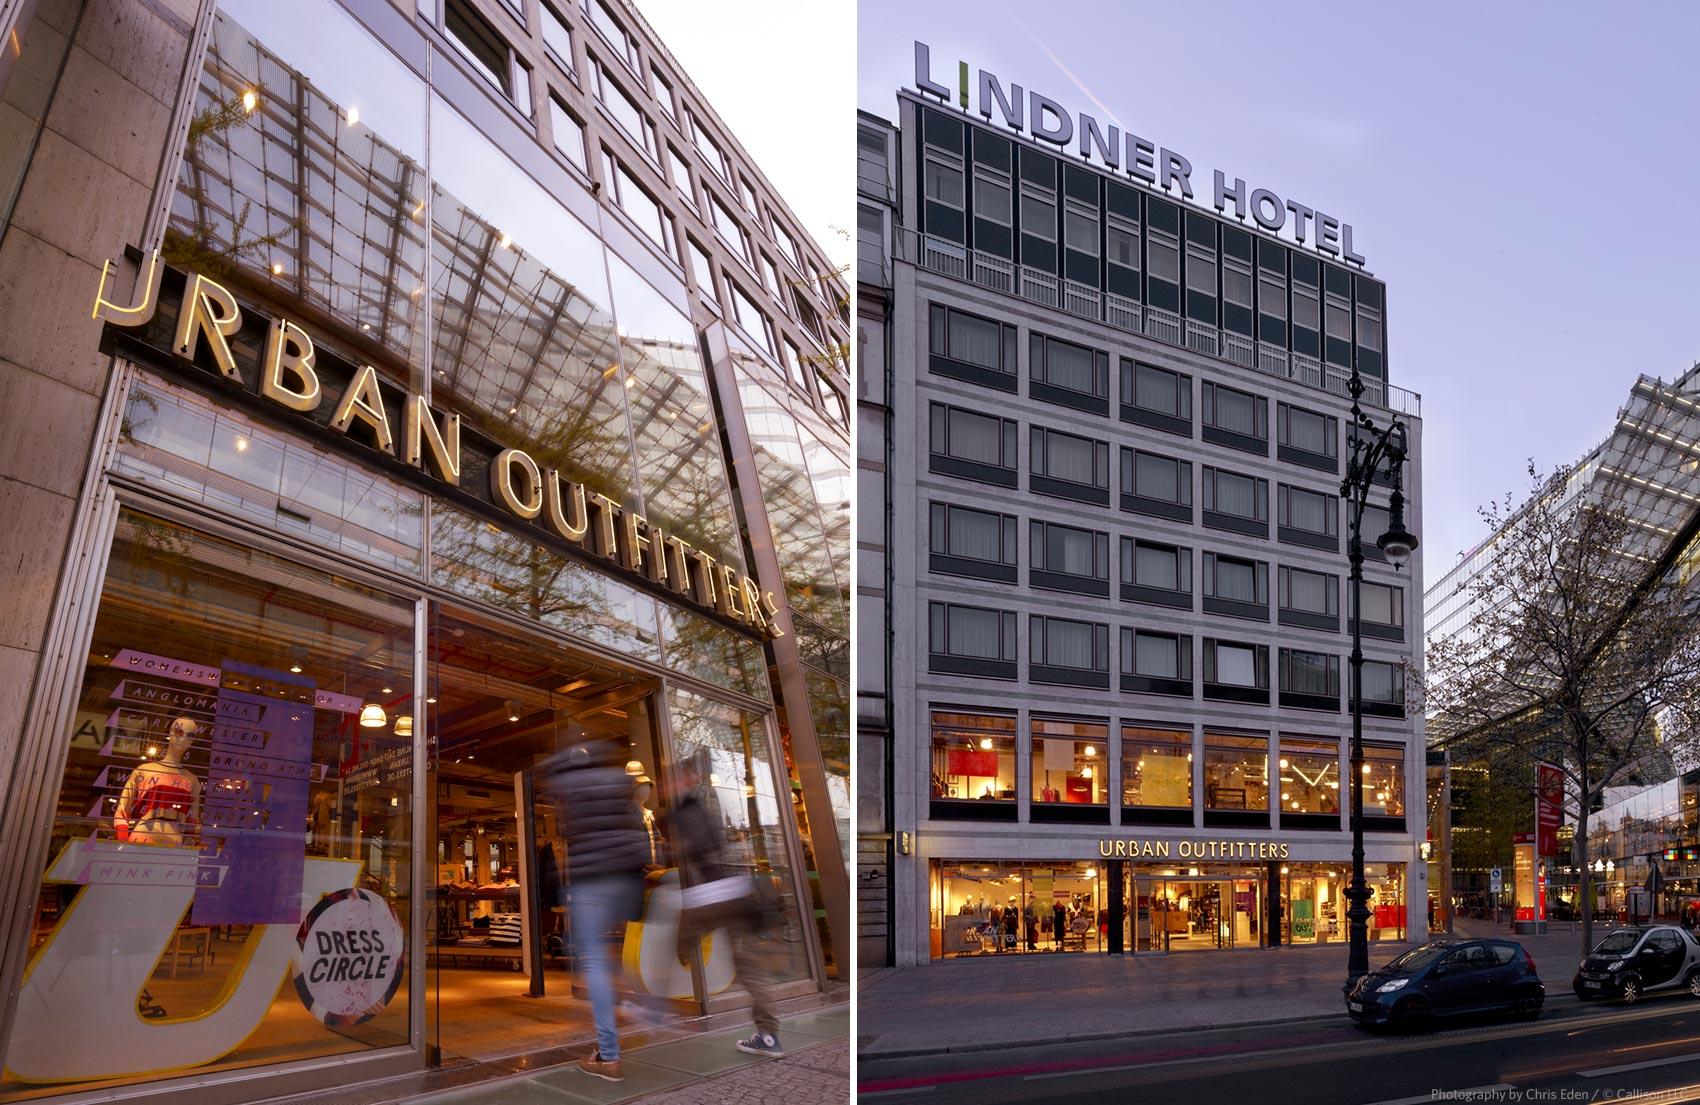 Urban Outfitters, Berlin -Kurfϋrstendamm - Exterior storefront